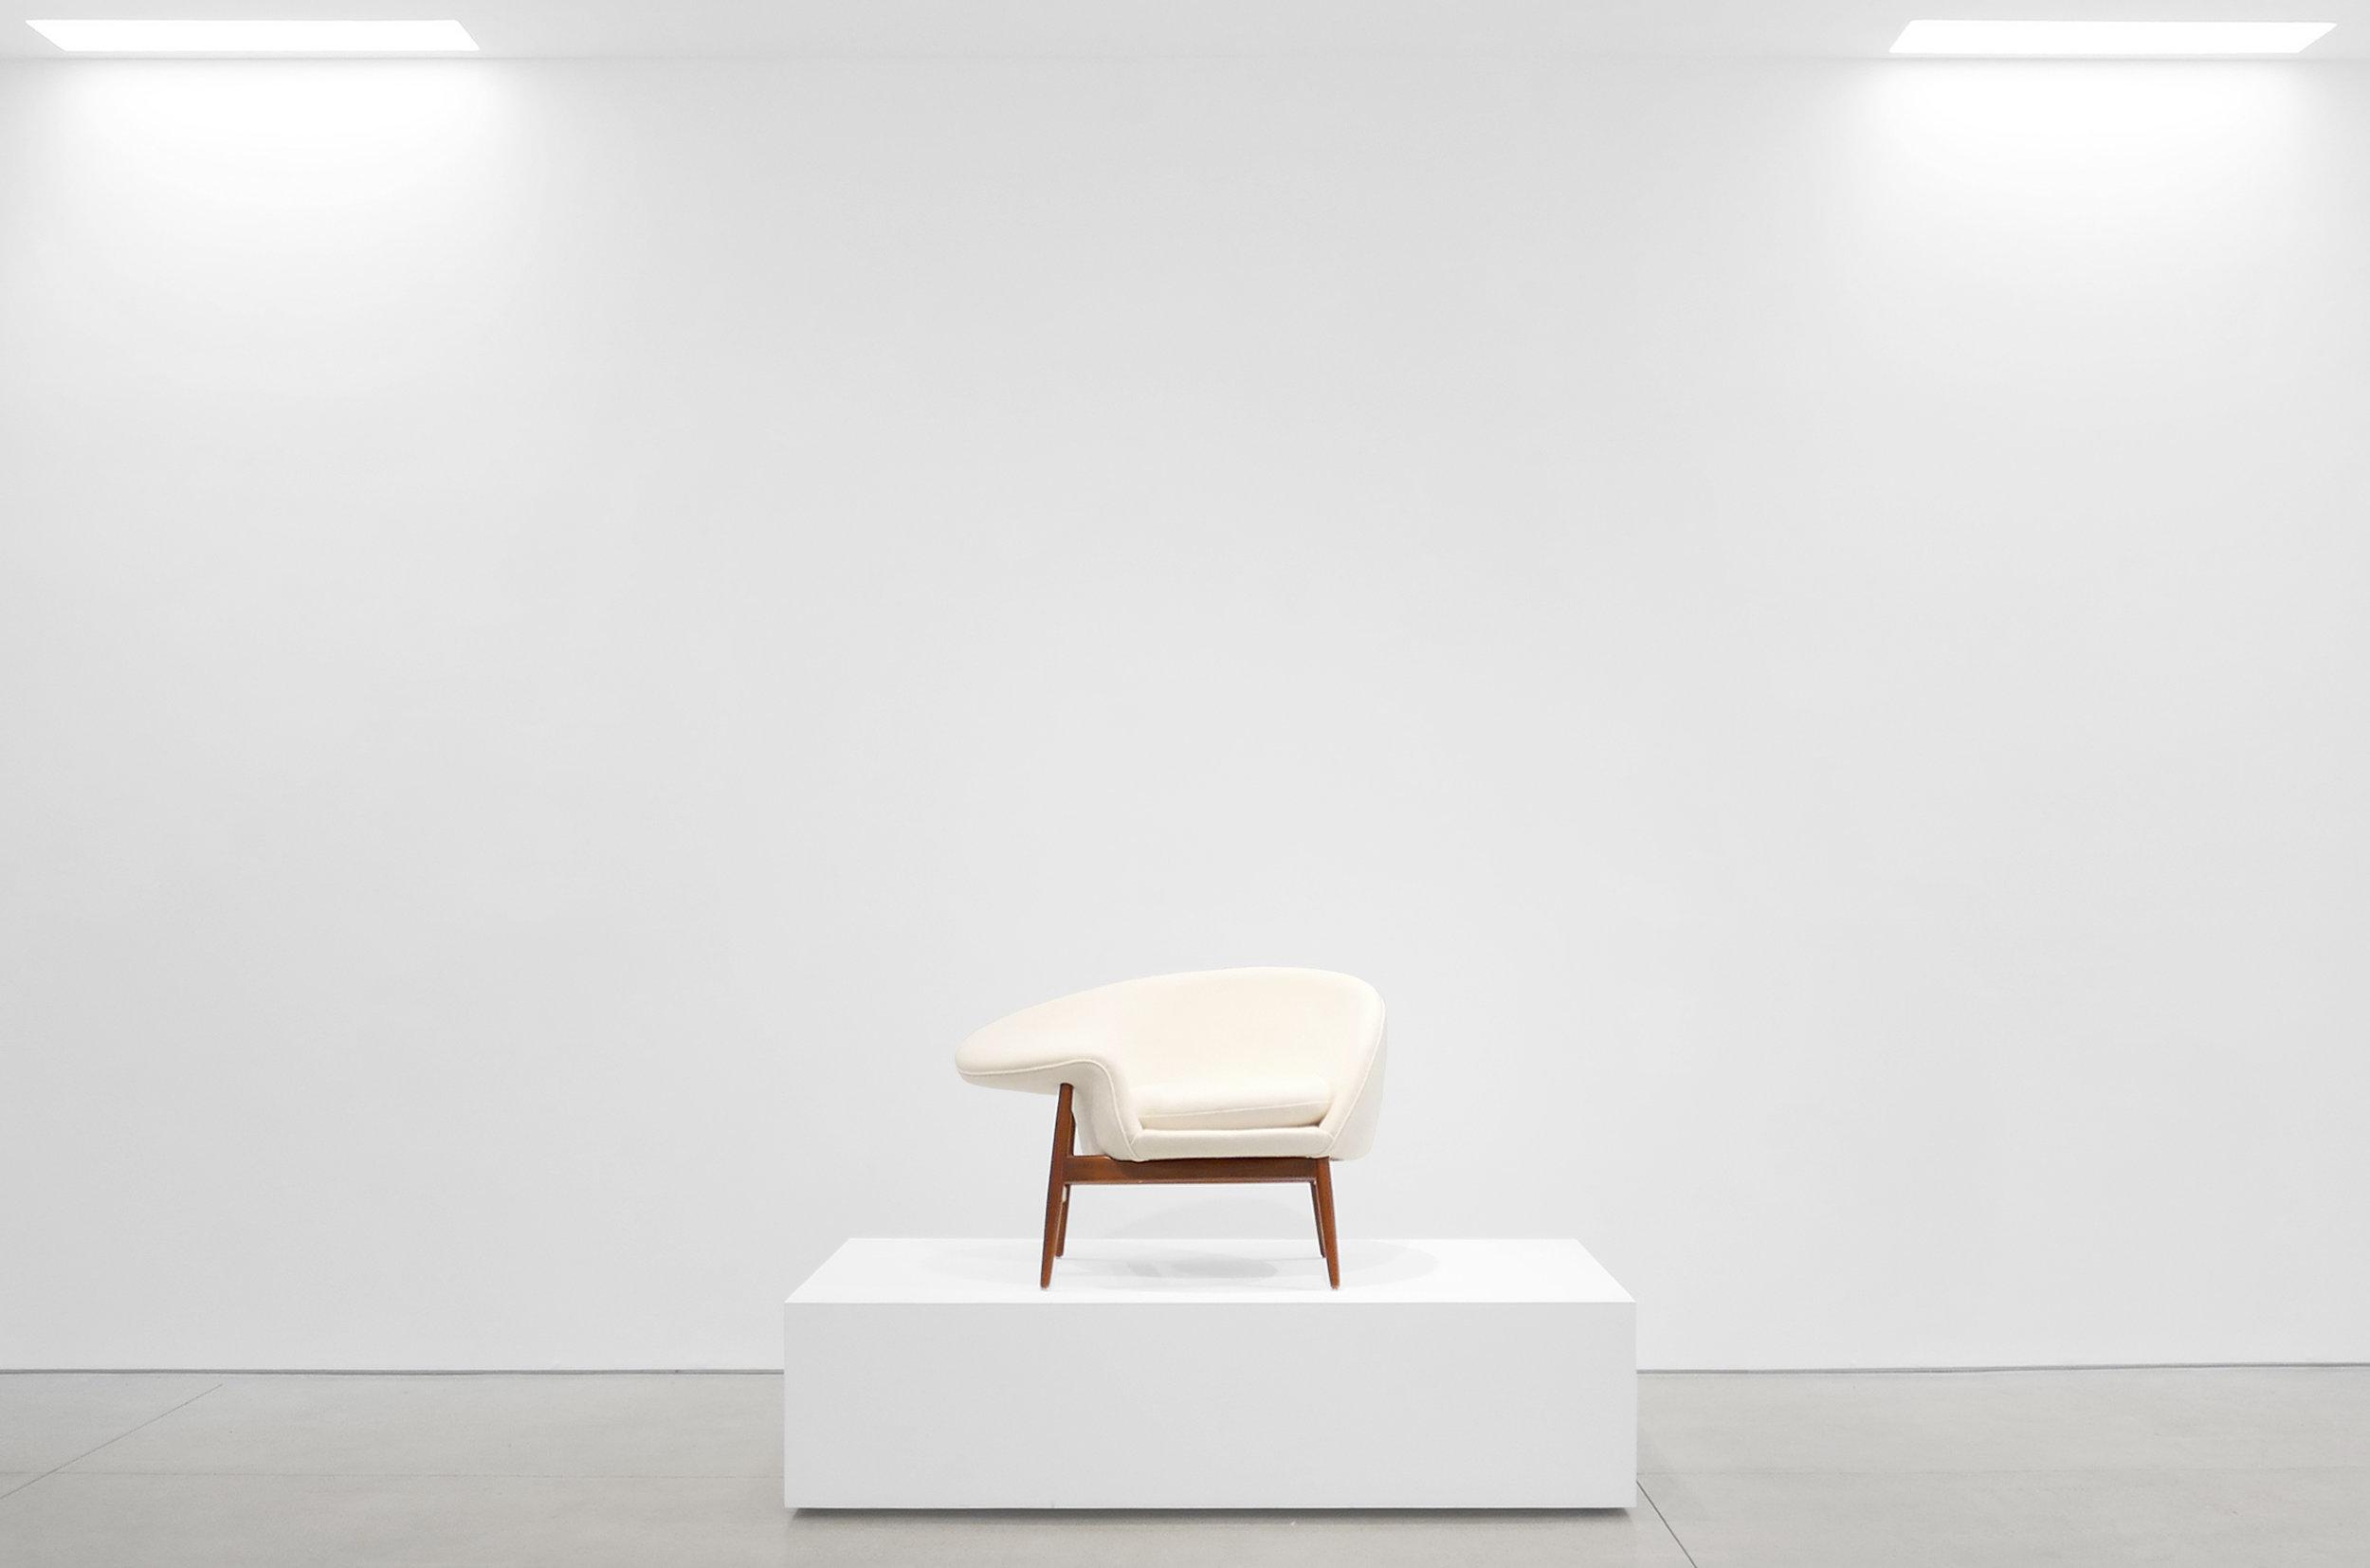 fried egg chair steel easy price hans olsen peter blake gallery 22fried 22 c 1956 holland sherry